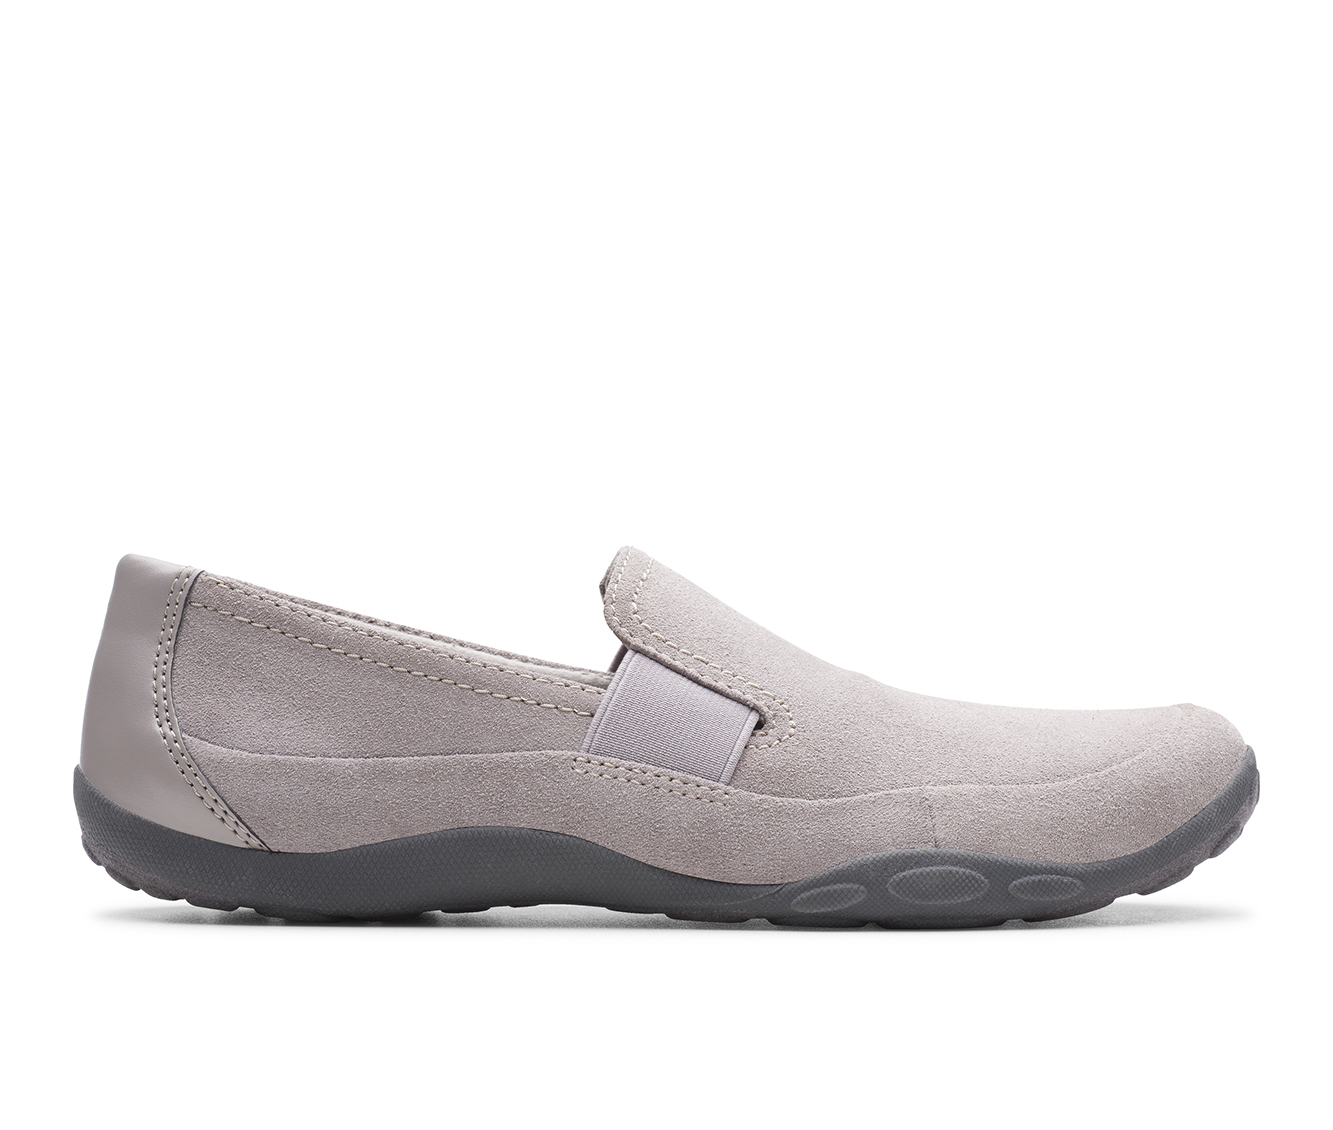 Clarks Haley Park Women's Shoe (Gray Suede)